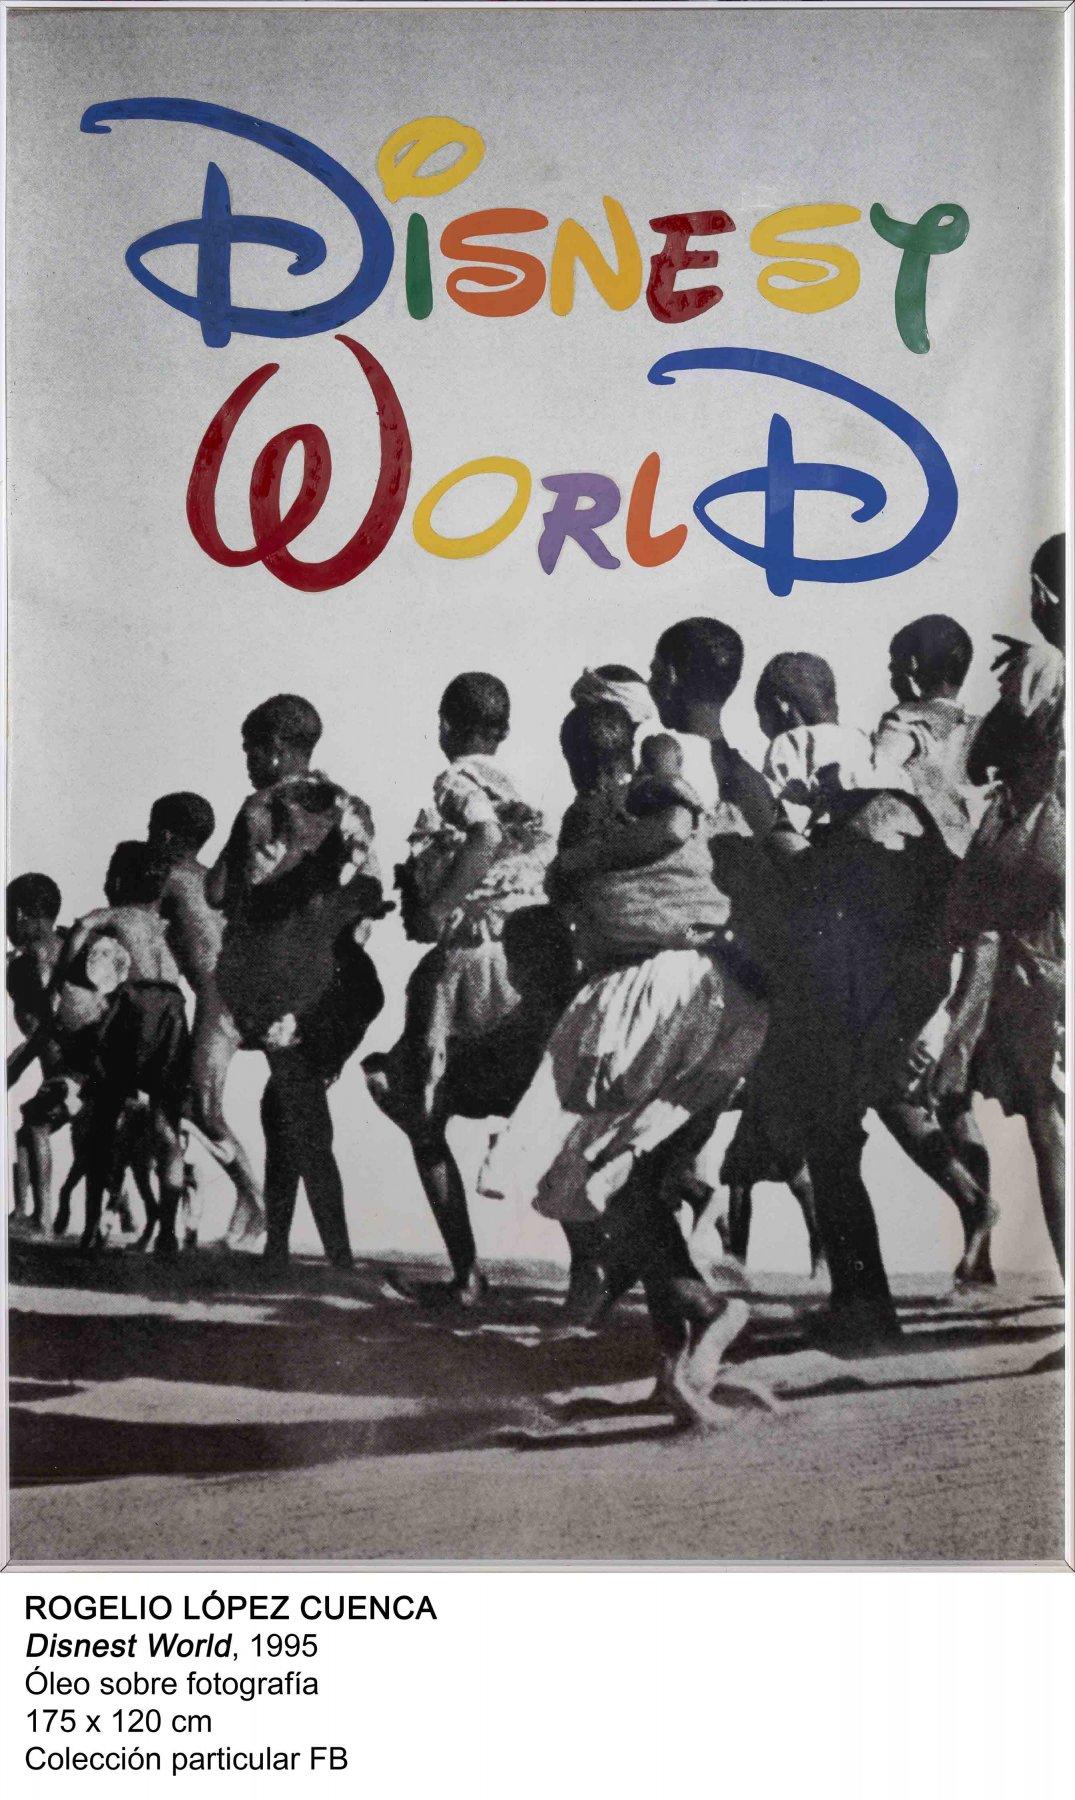 Disnest World (1995) - Rogelio López Cuenca